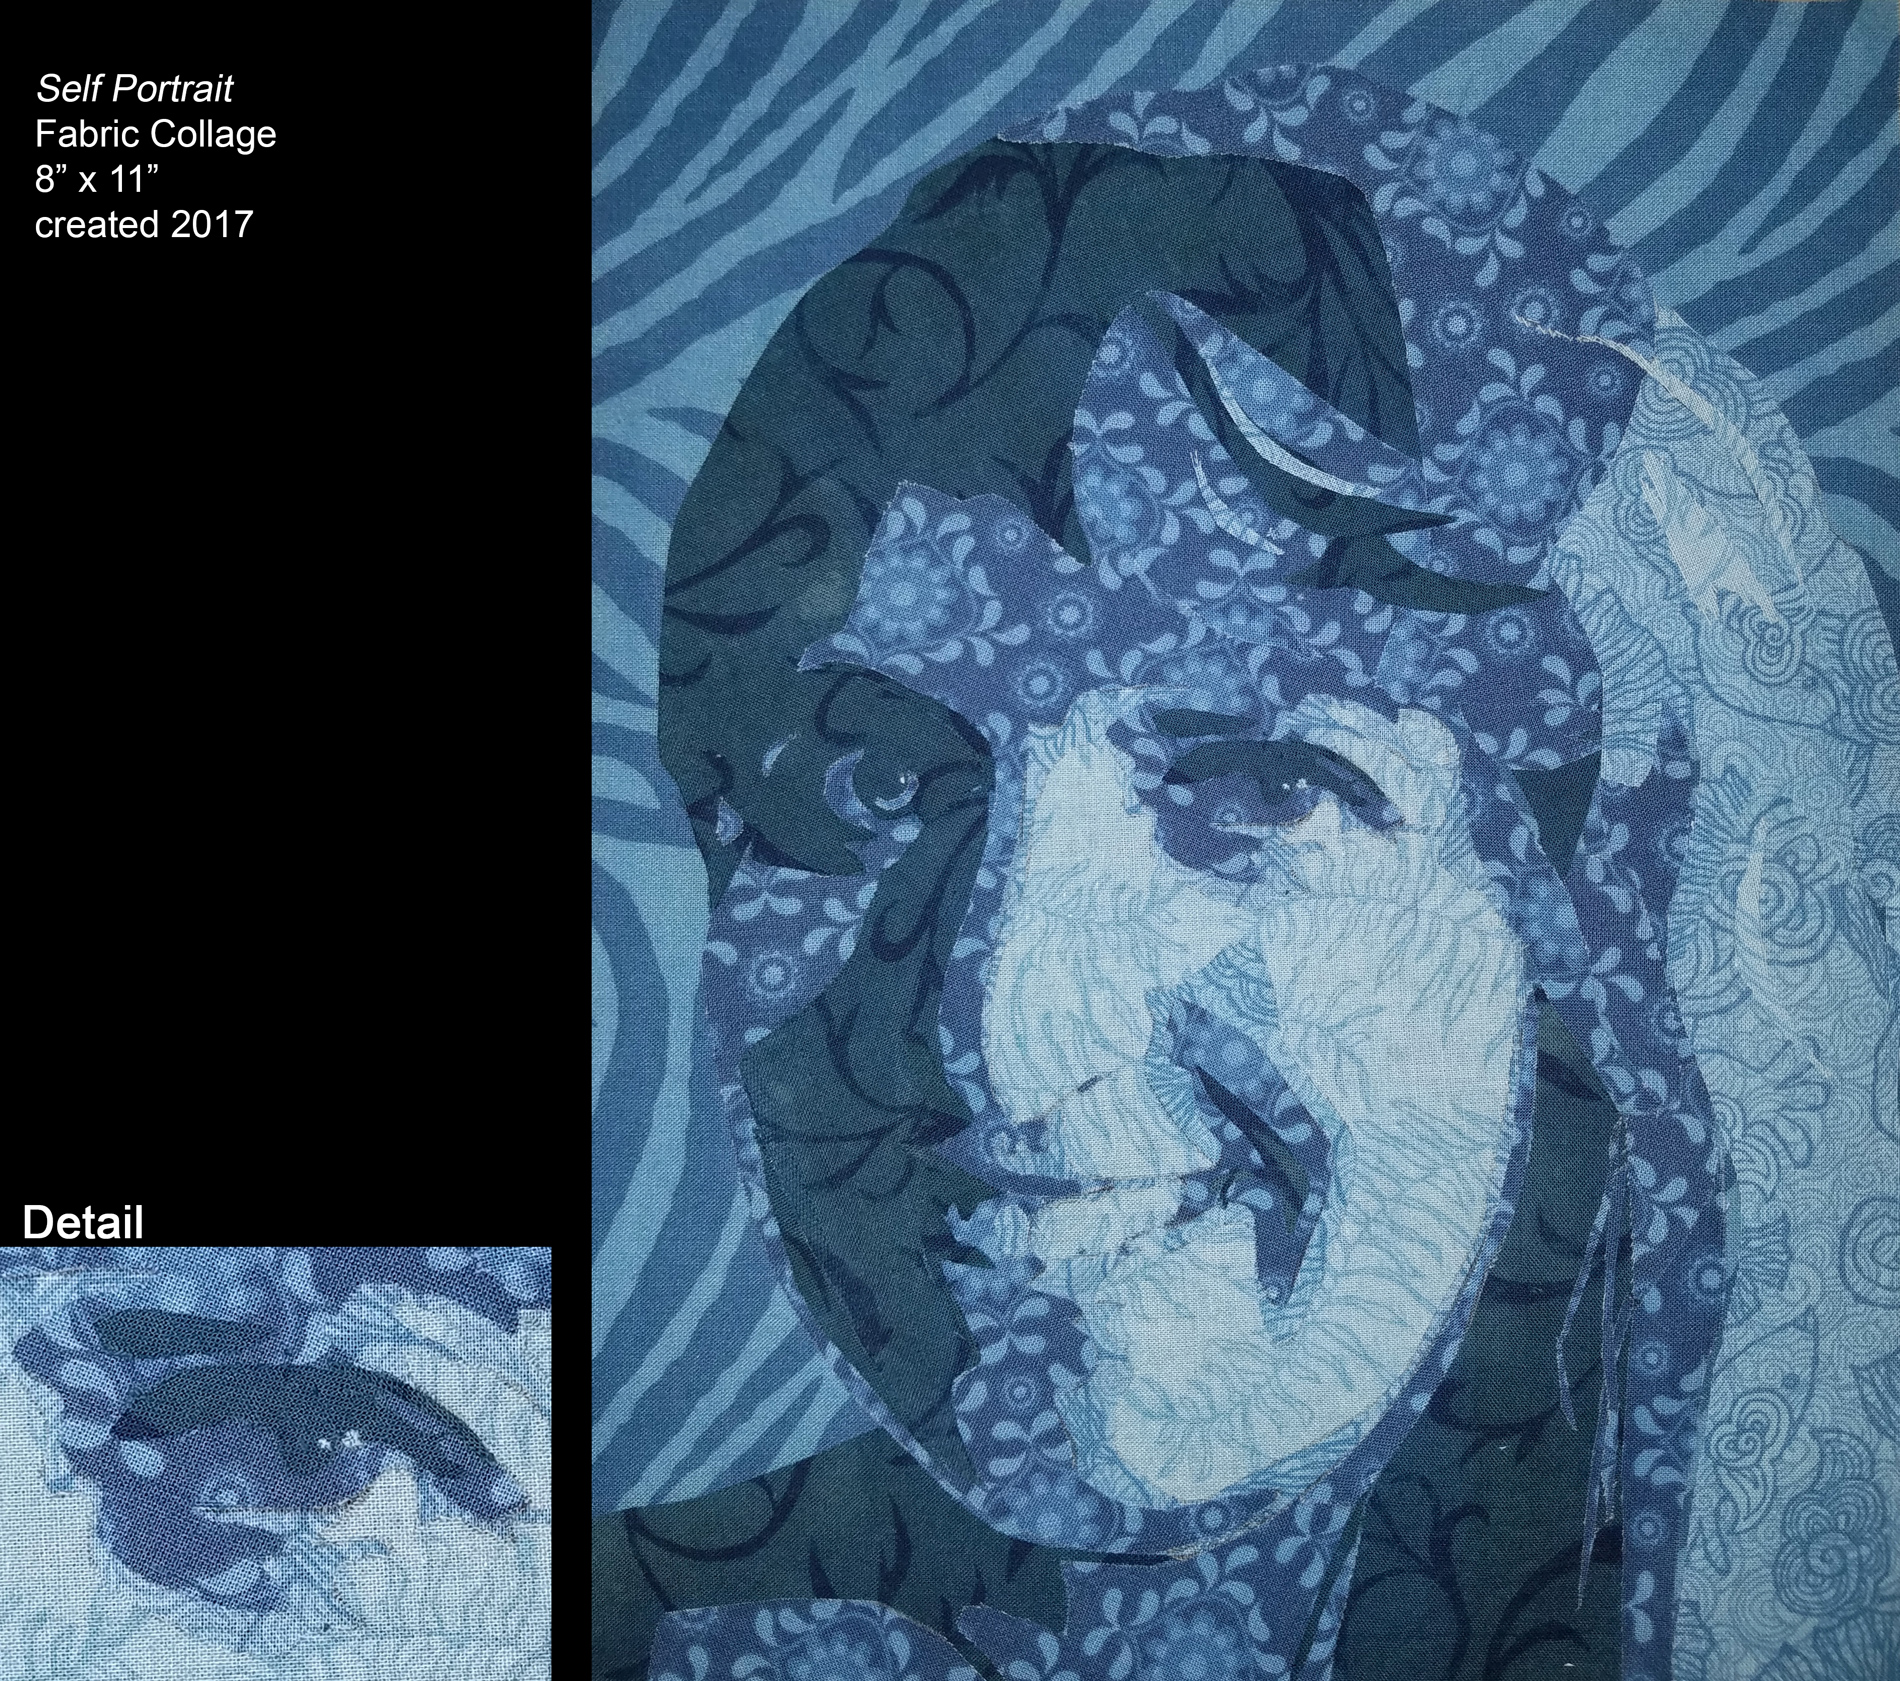 Fabric-Collage_self-portrait.jpg